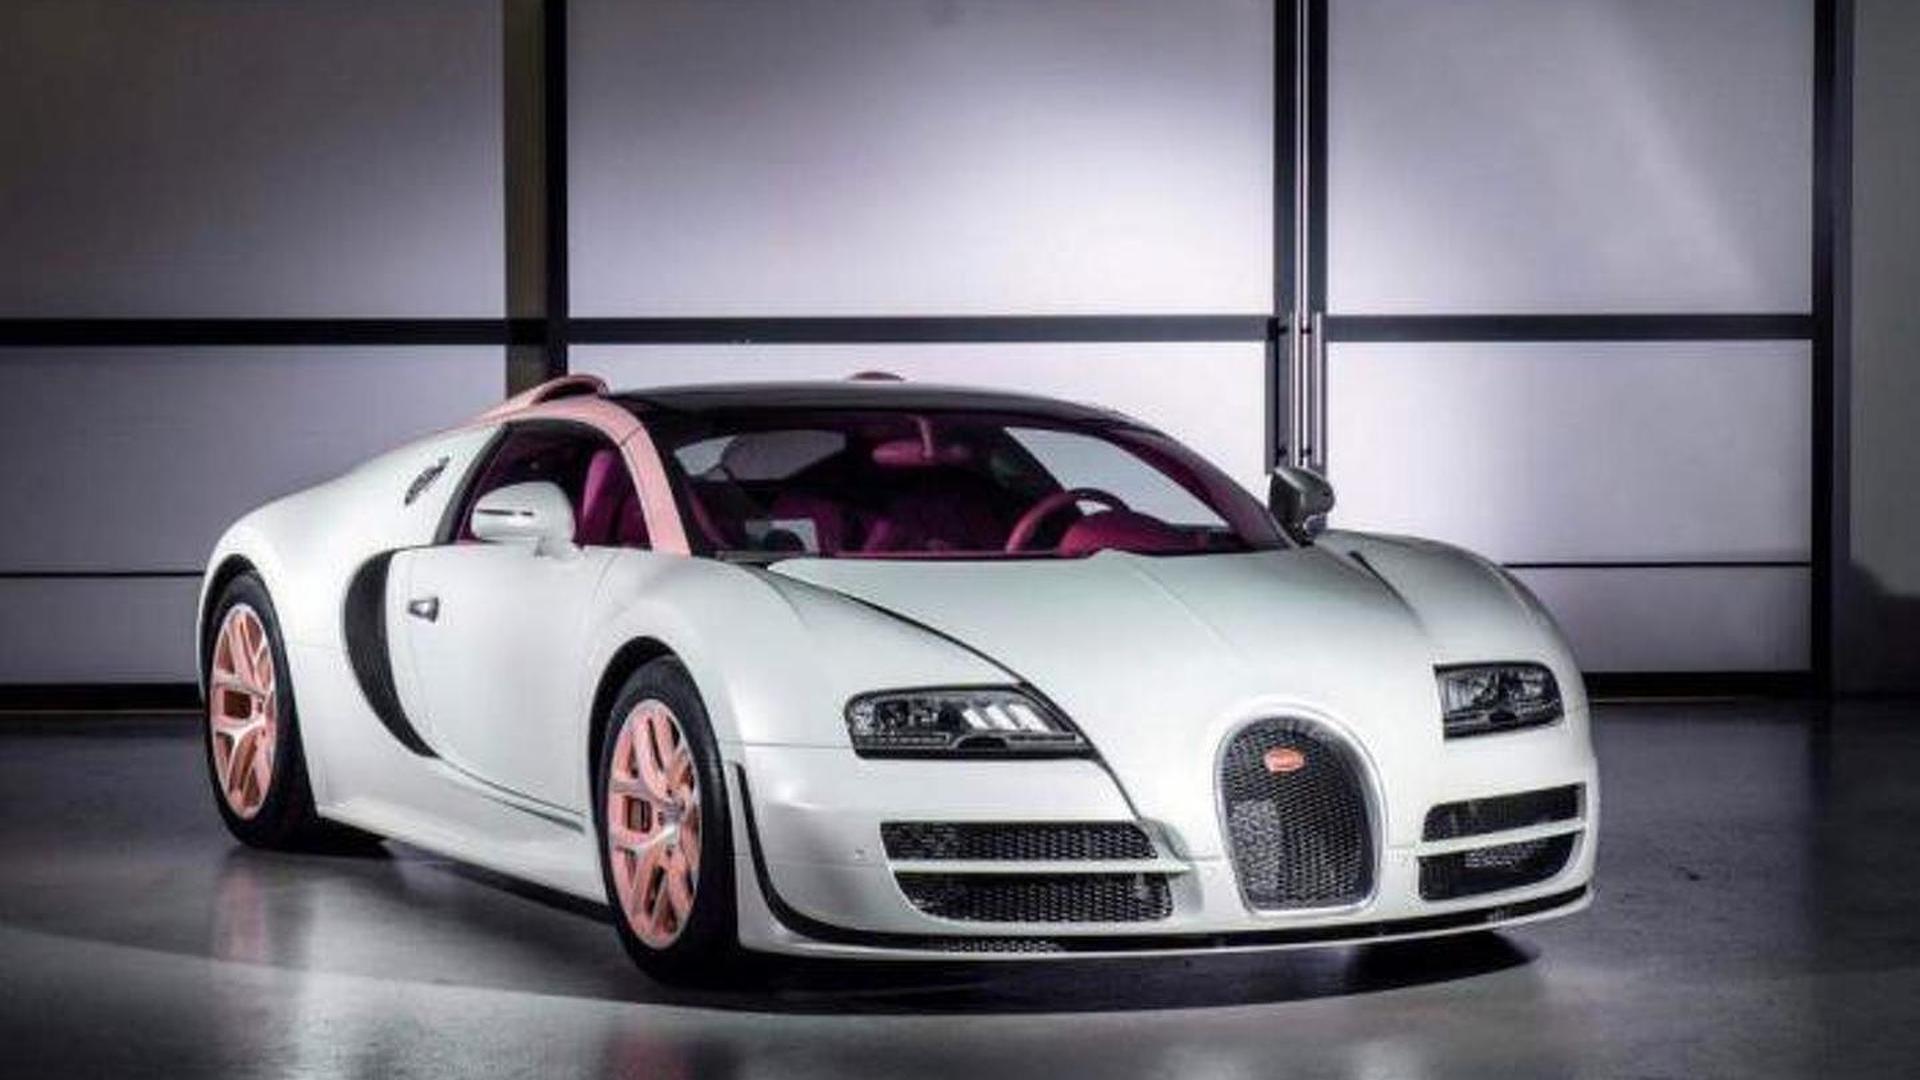 2015-553504-bugatti-veyron-grand-sport-vitesse-cristal-edition1 Exciting Bugatti Veyron New Model 2015 Cars Trend